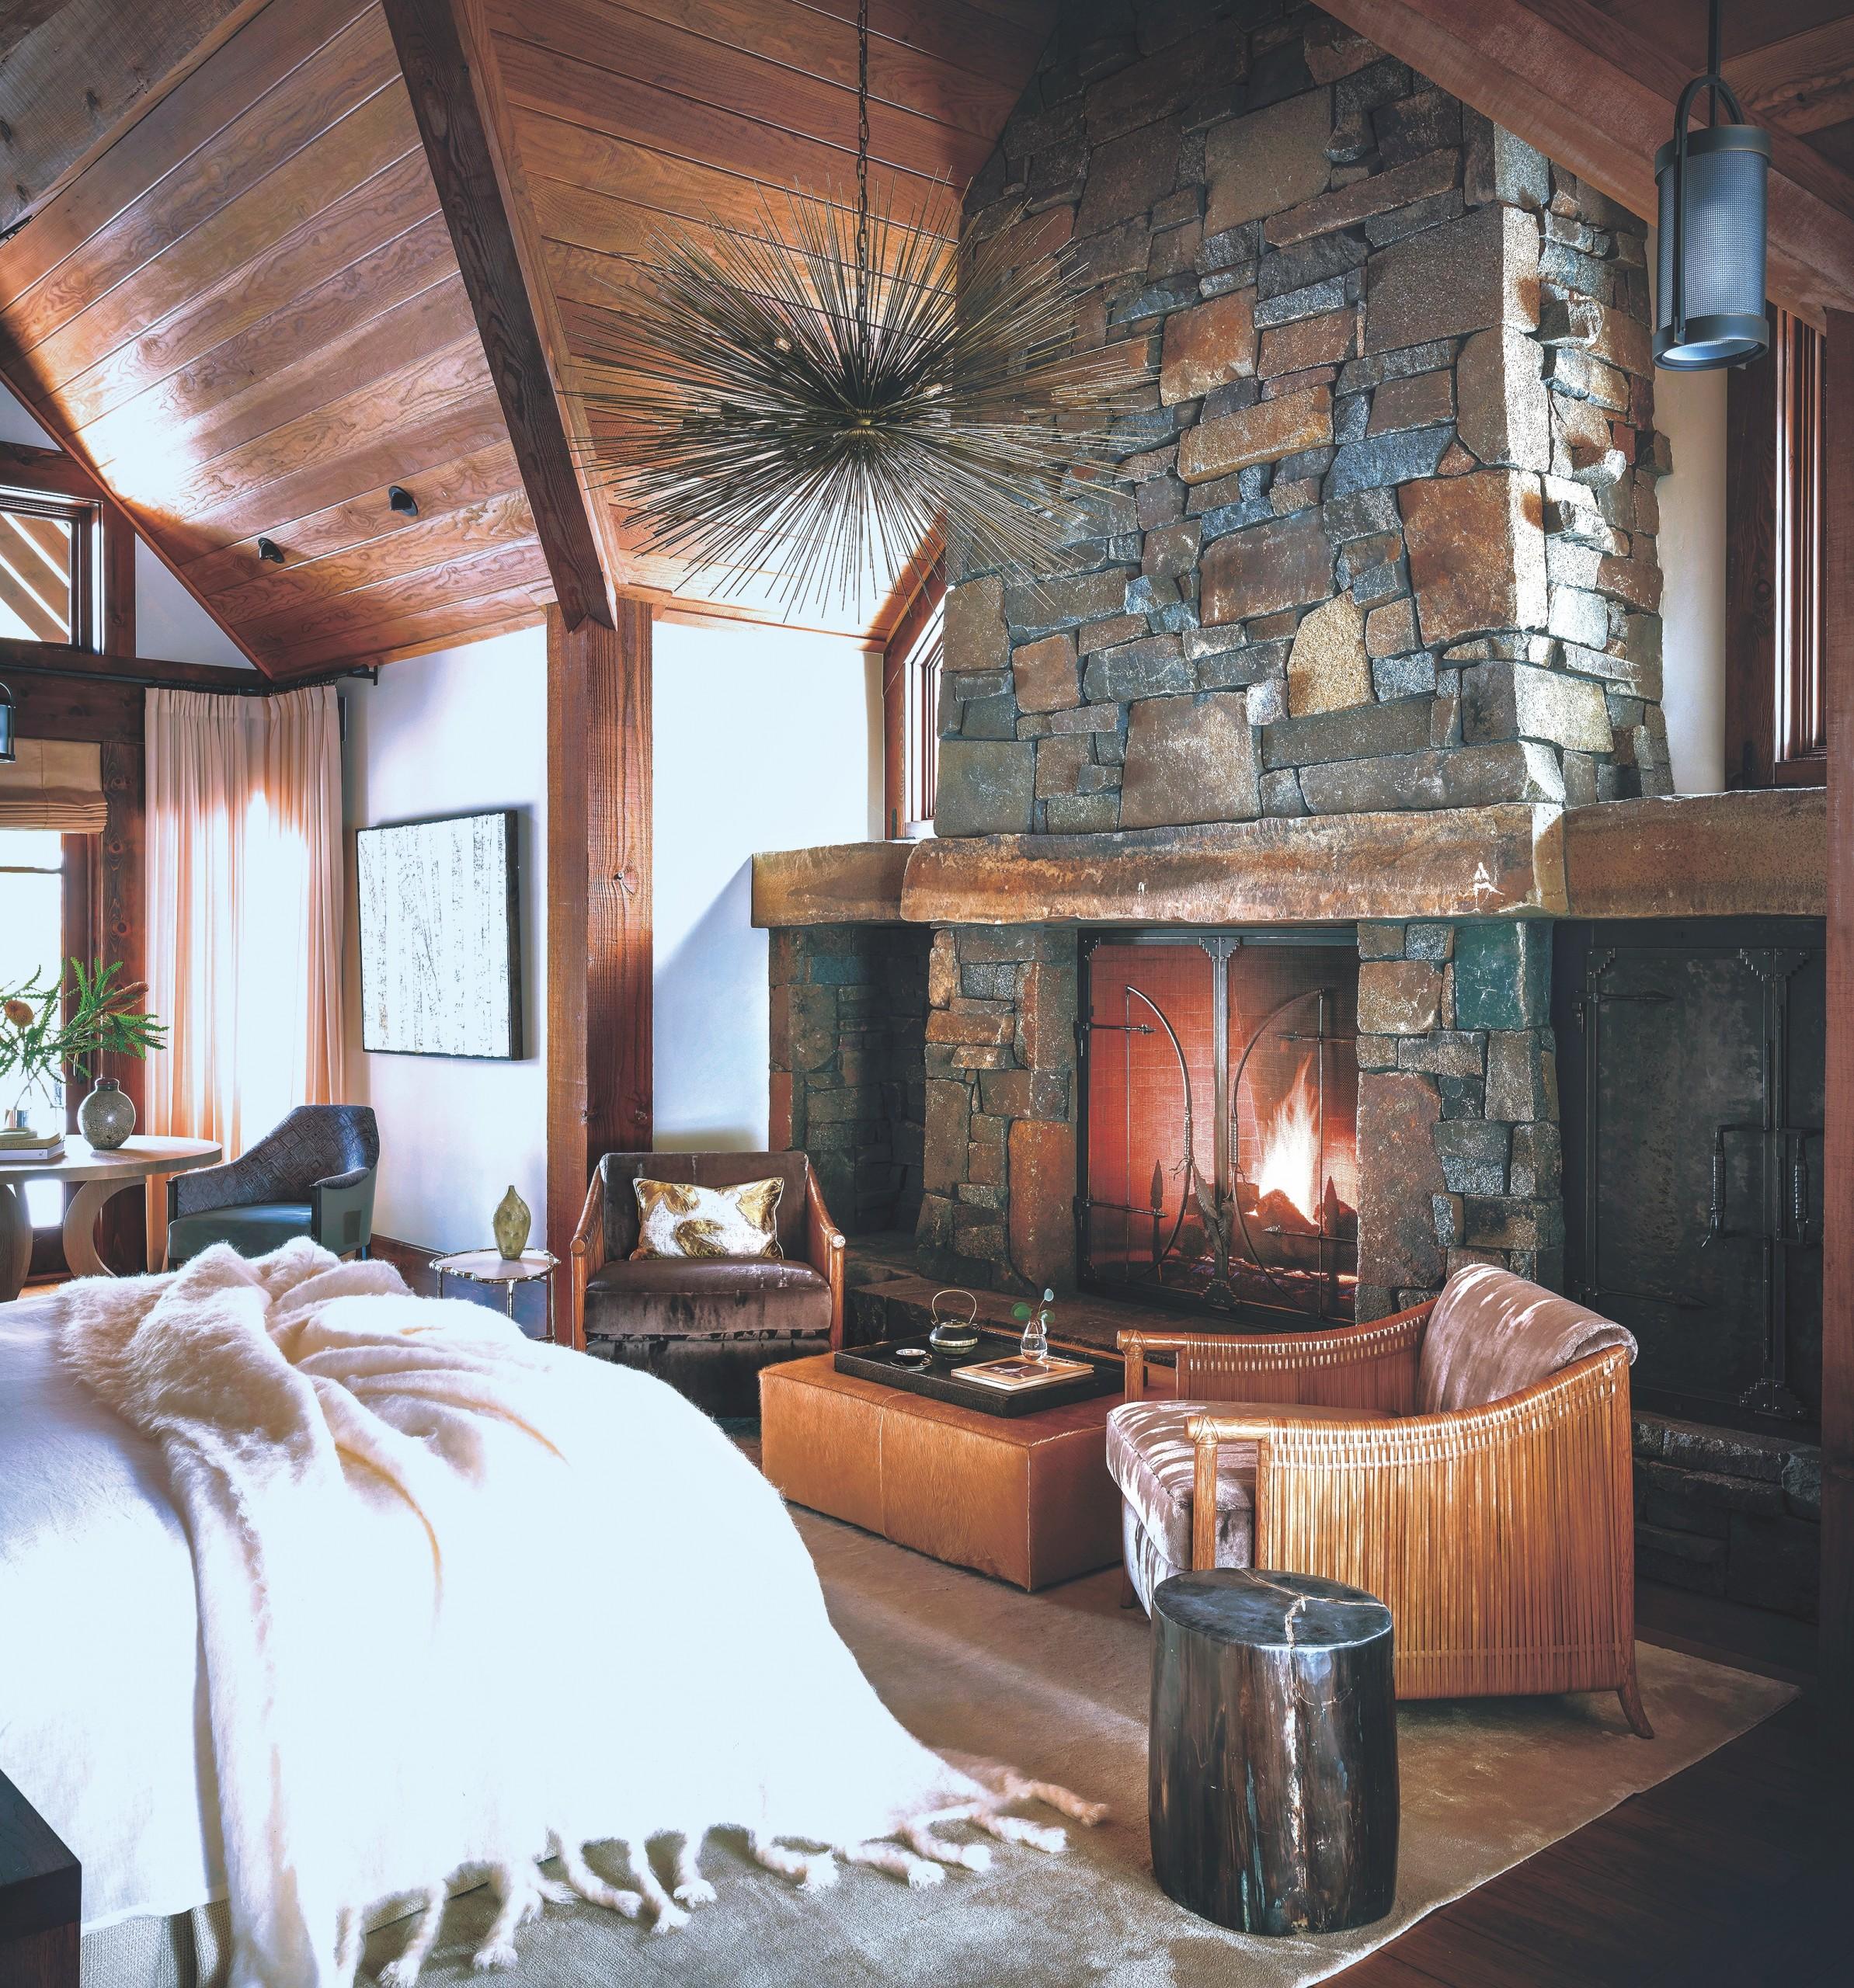 Tahoe Bed Fire